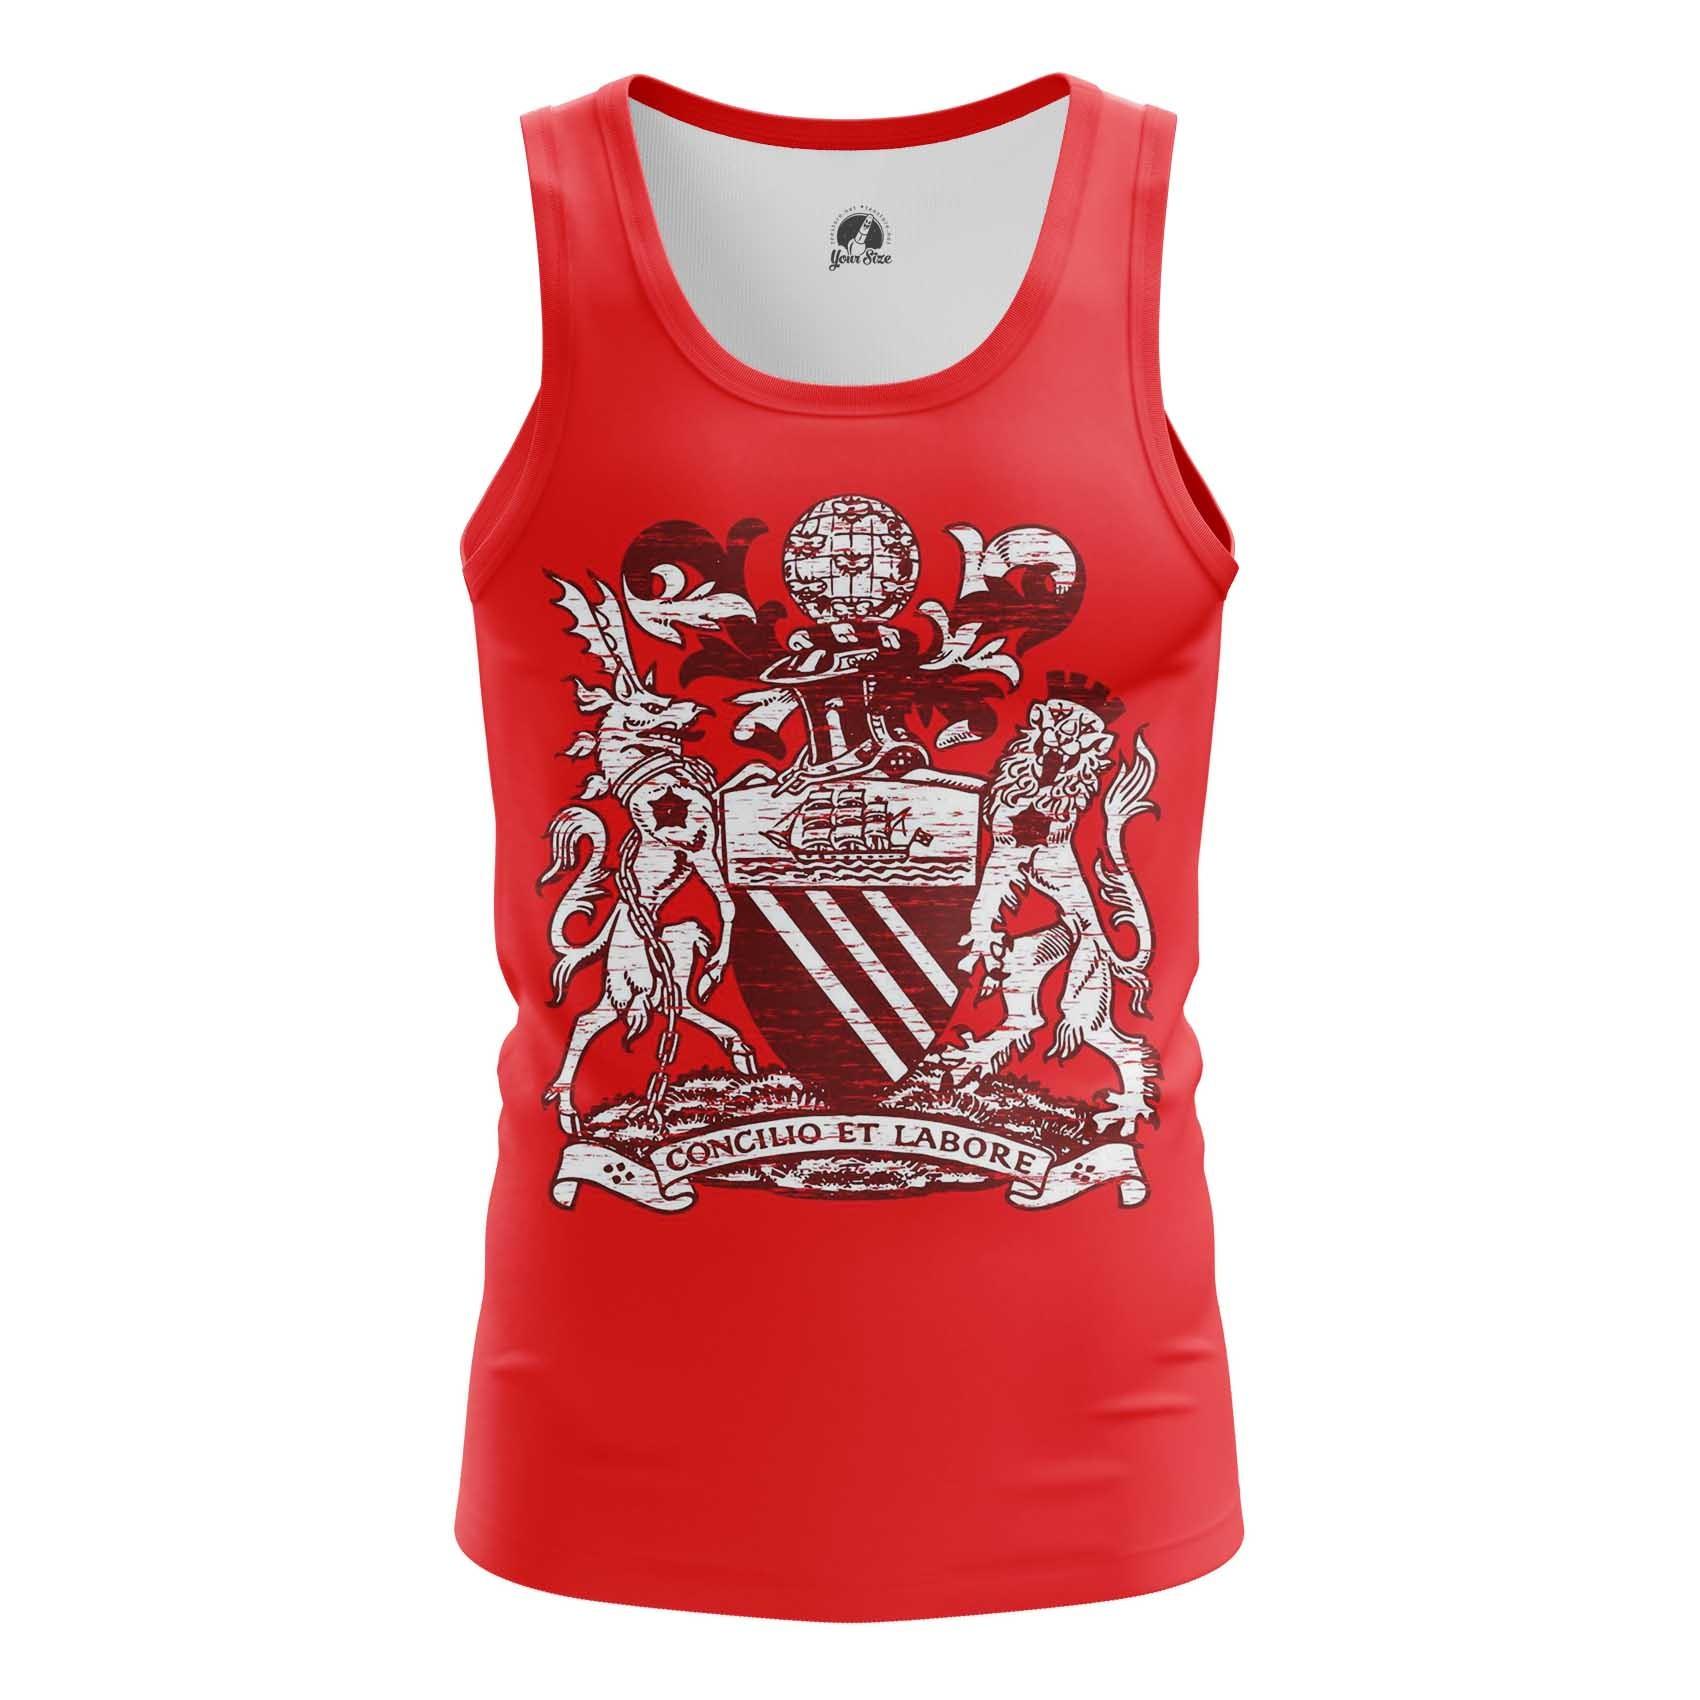 Merchandise Tank Manchester United Vest